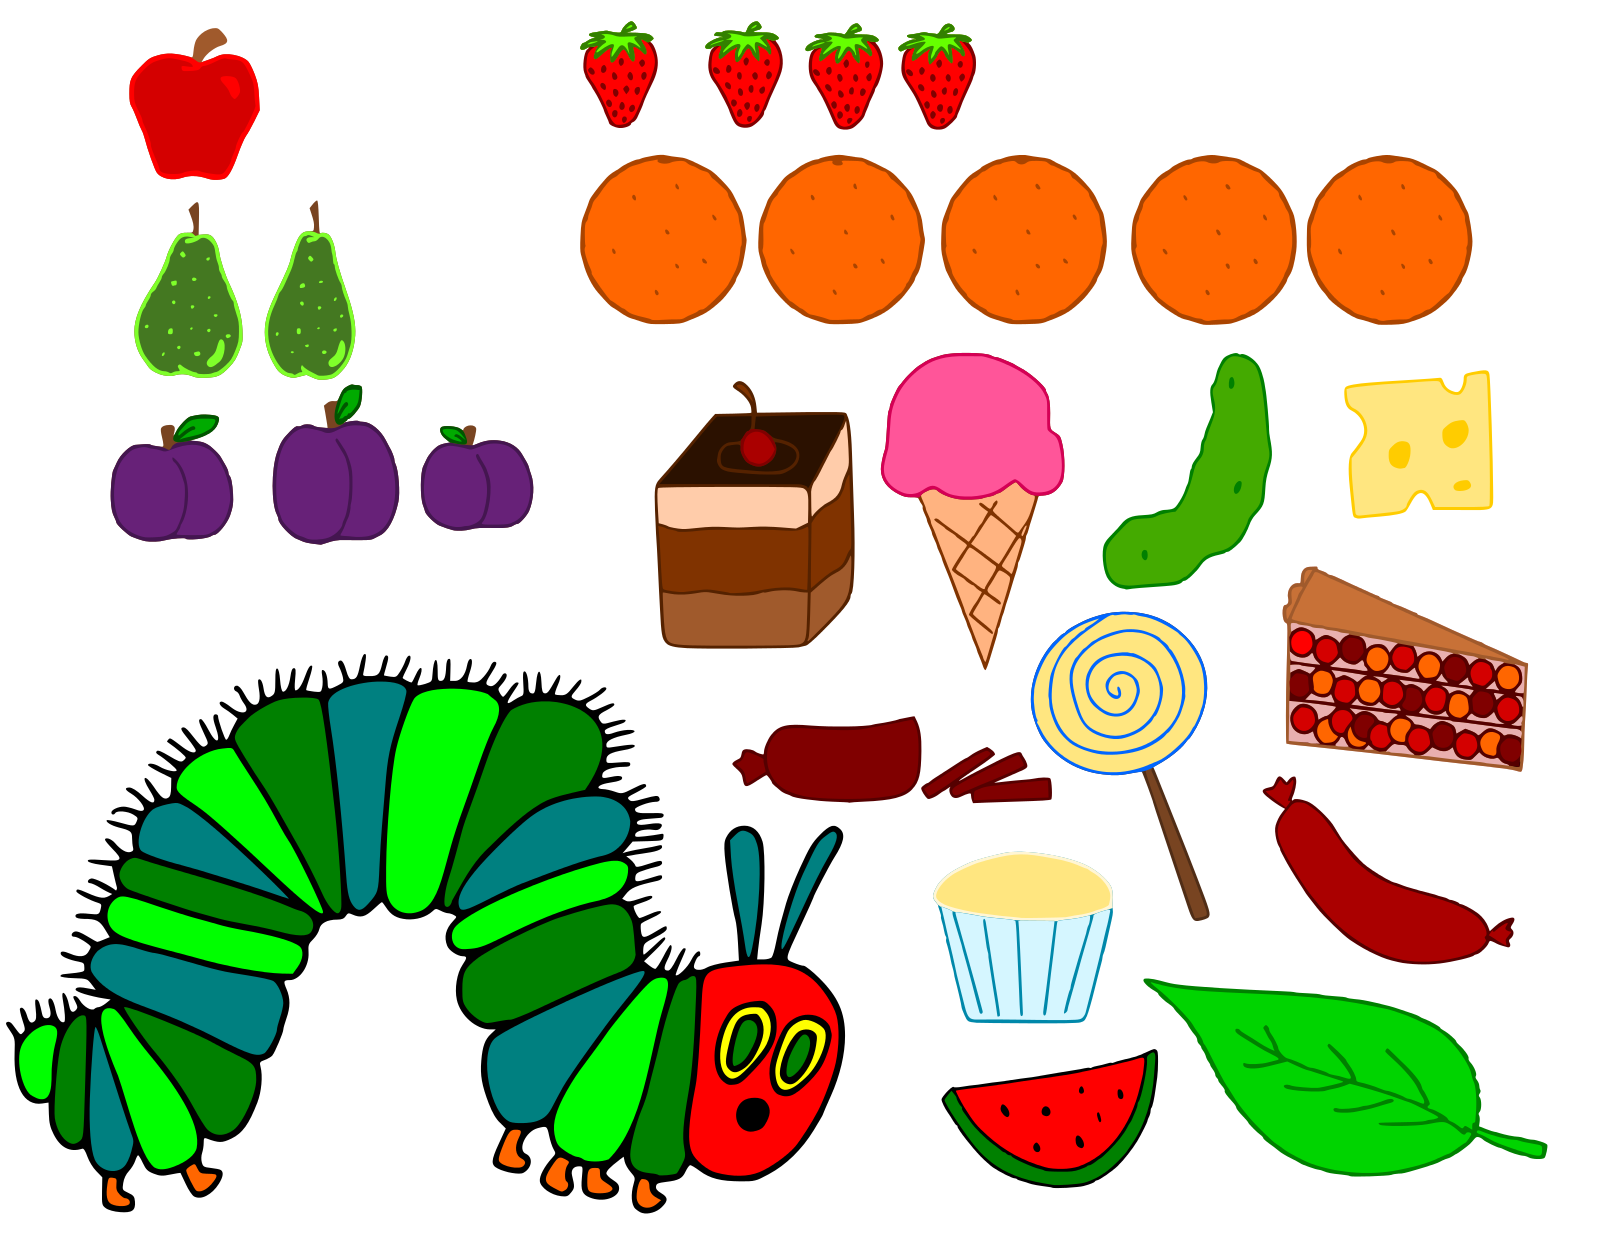 Krafty Nook The Very Hungry Caterpillar Svg Files